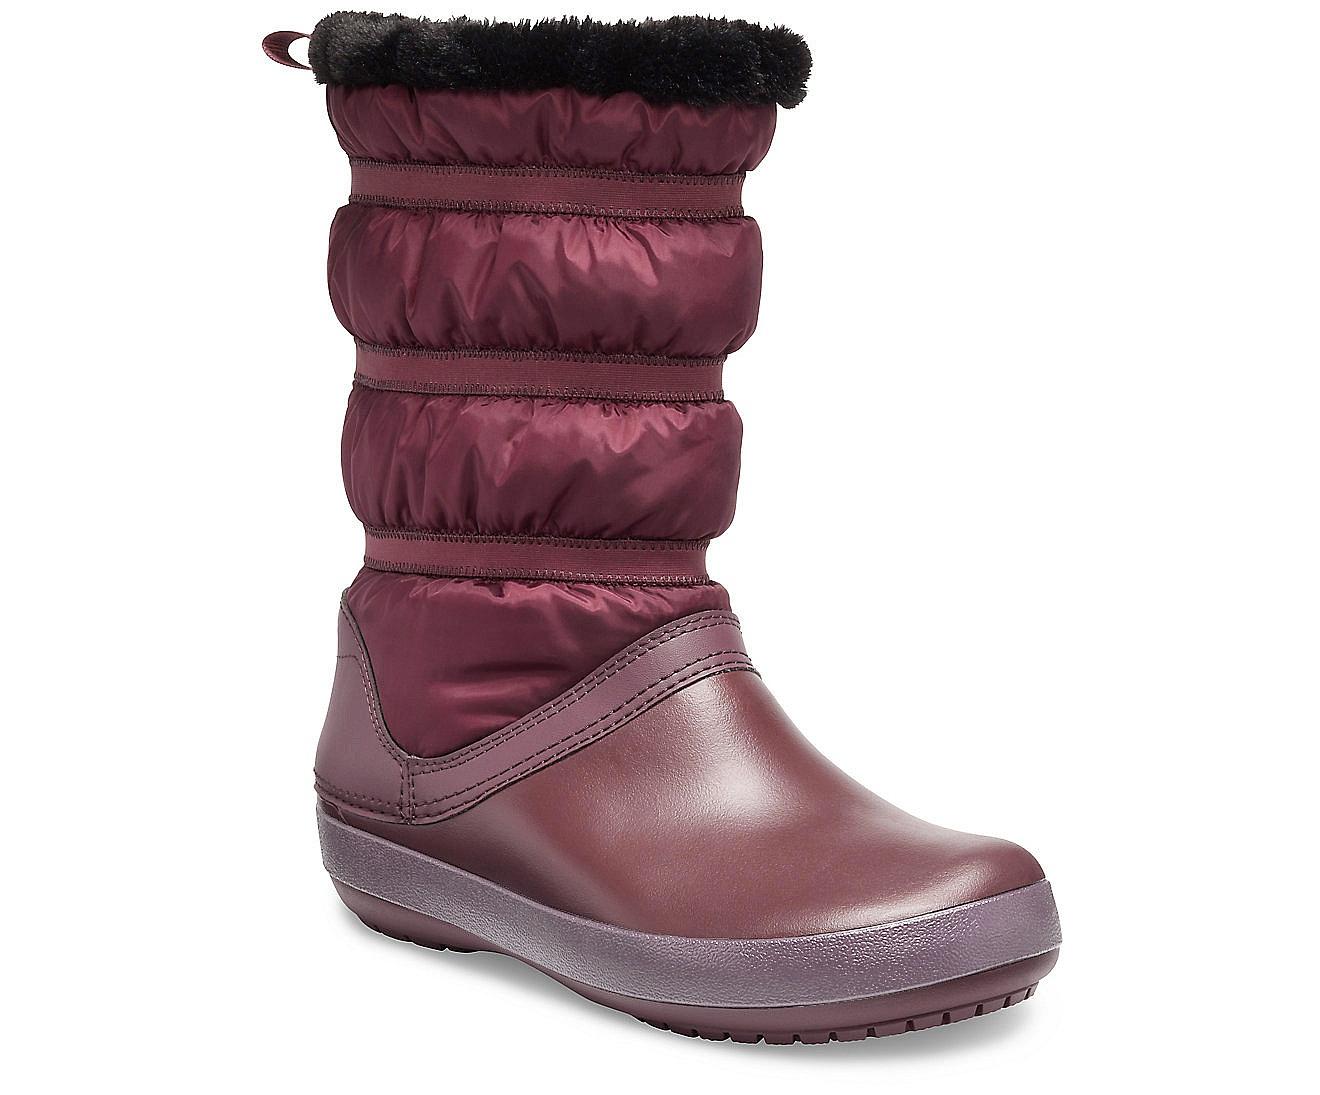 boty Crocs Crocband Winter Boot - Burgundy 36/37